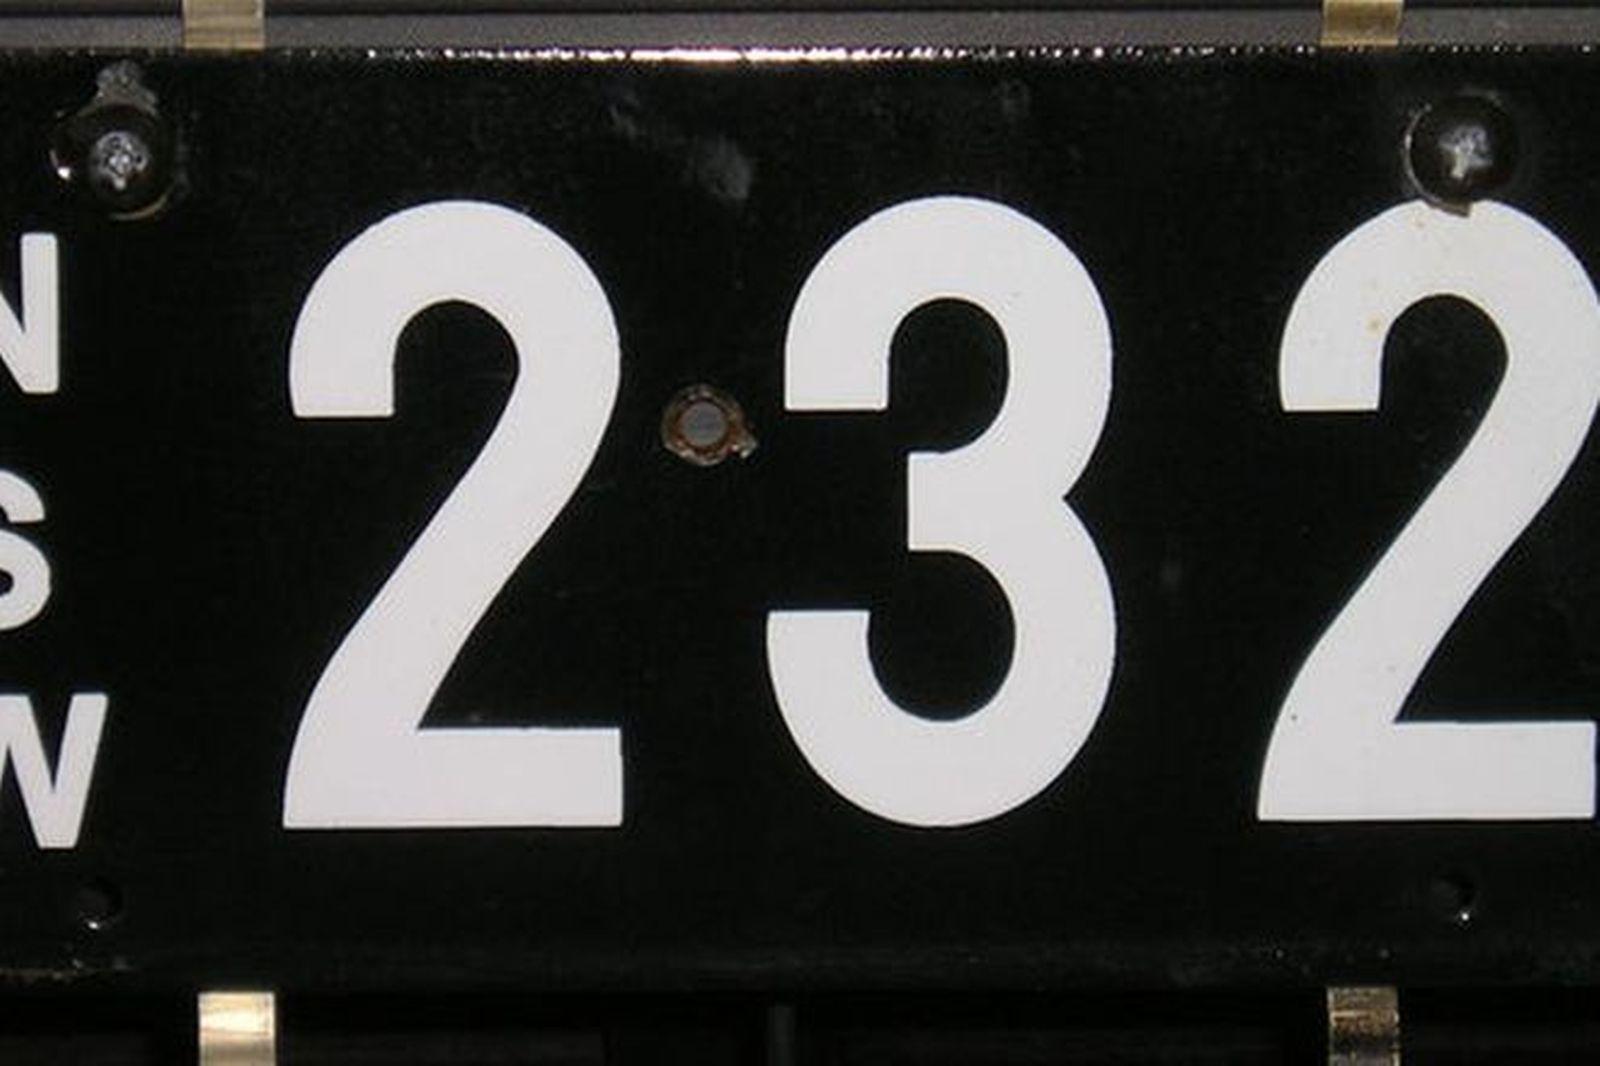 NSW Vitroeus Enamel Number Plates '232'